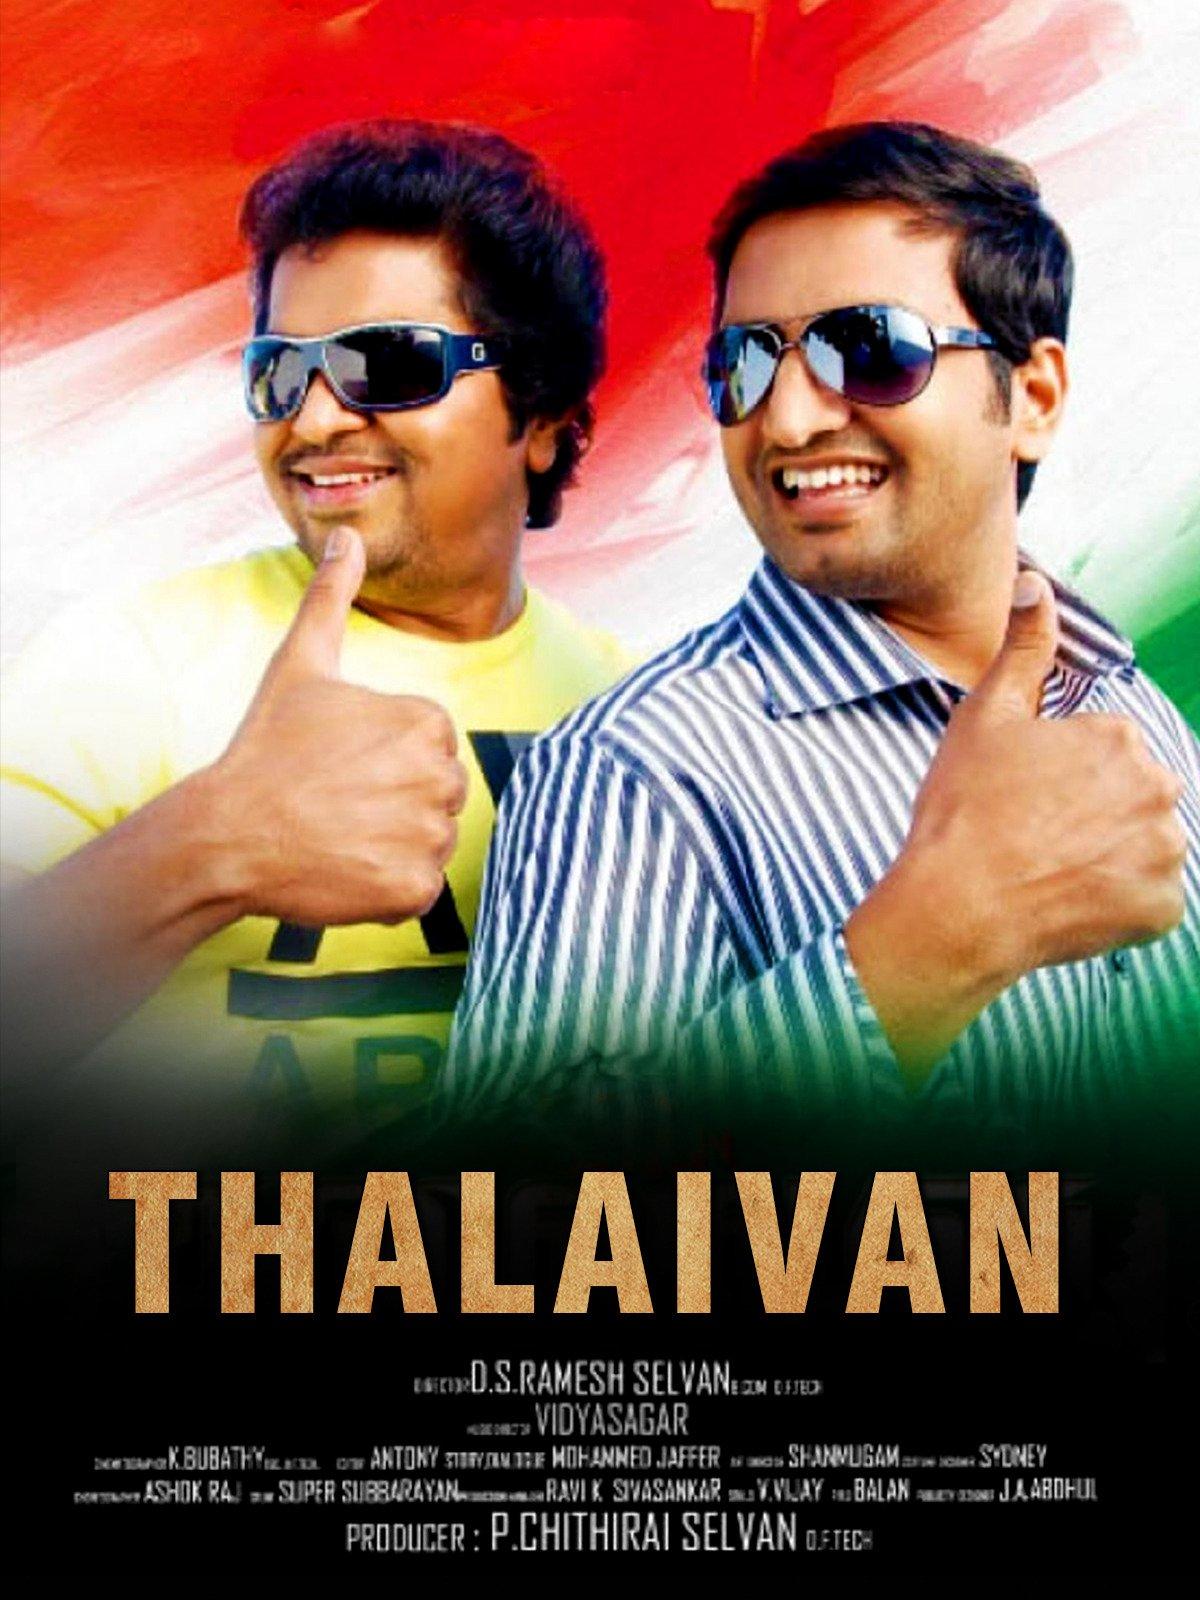 Thalaivan